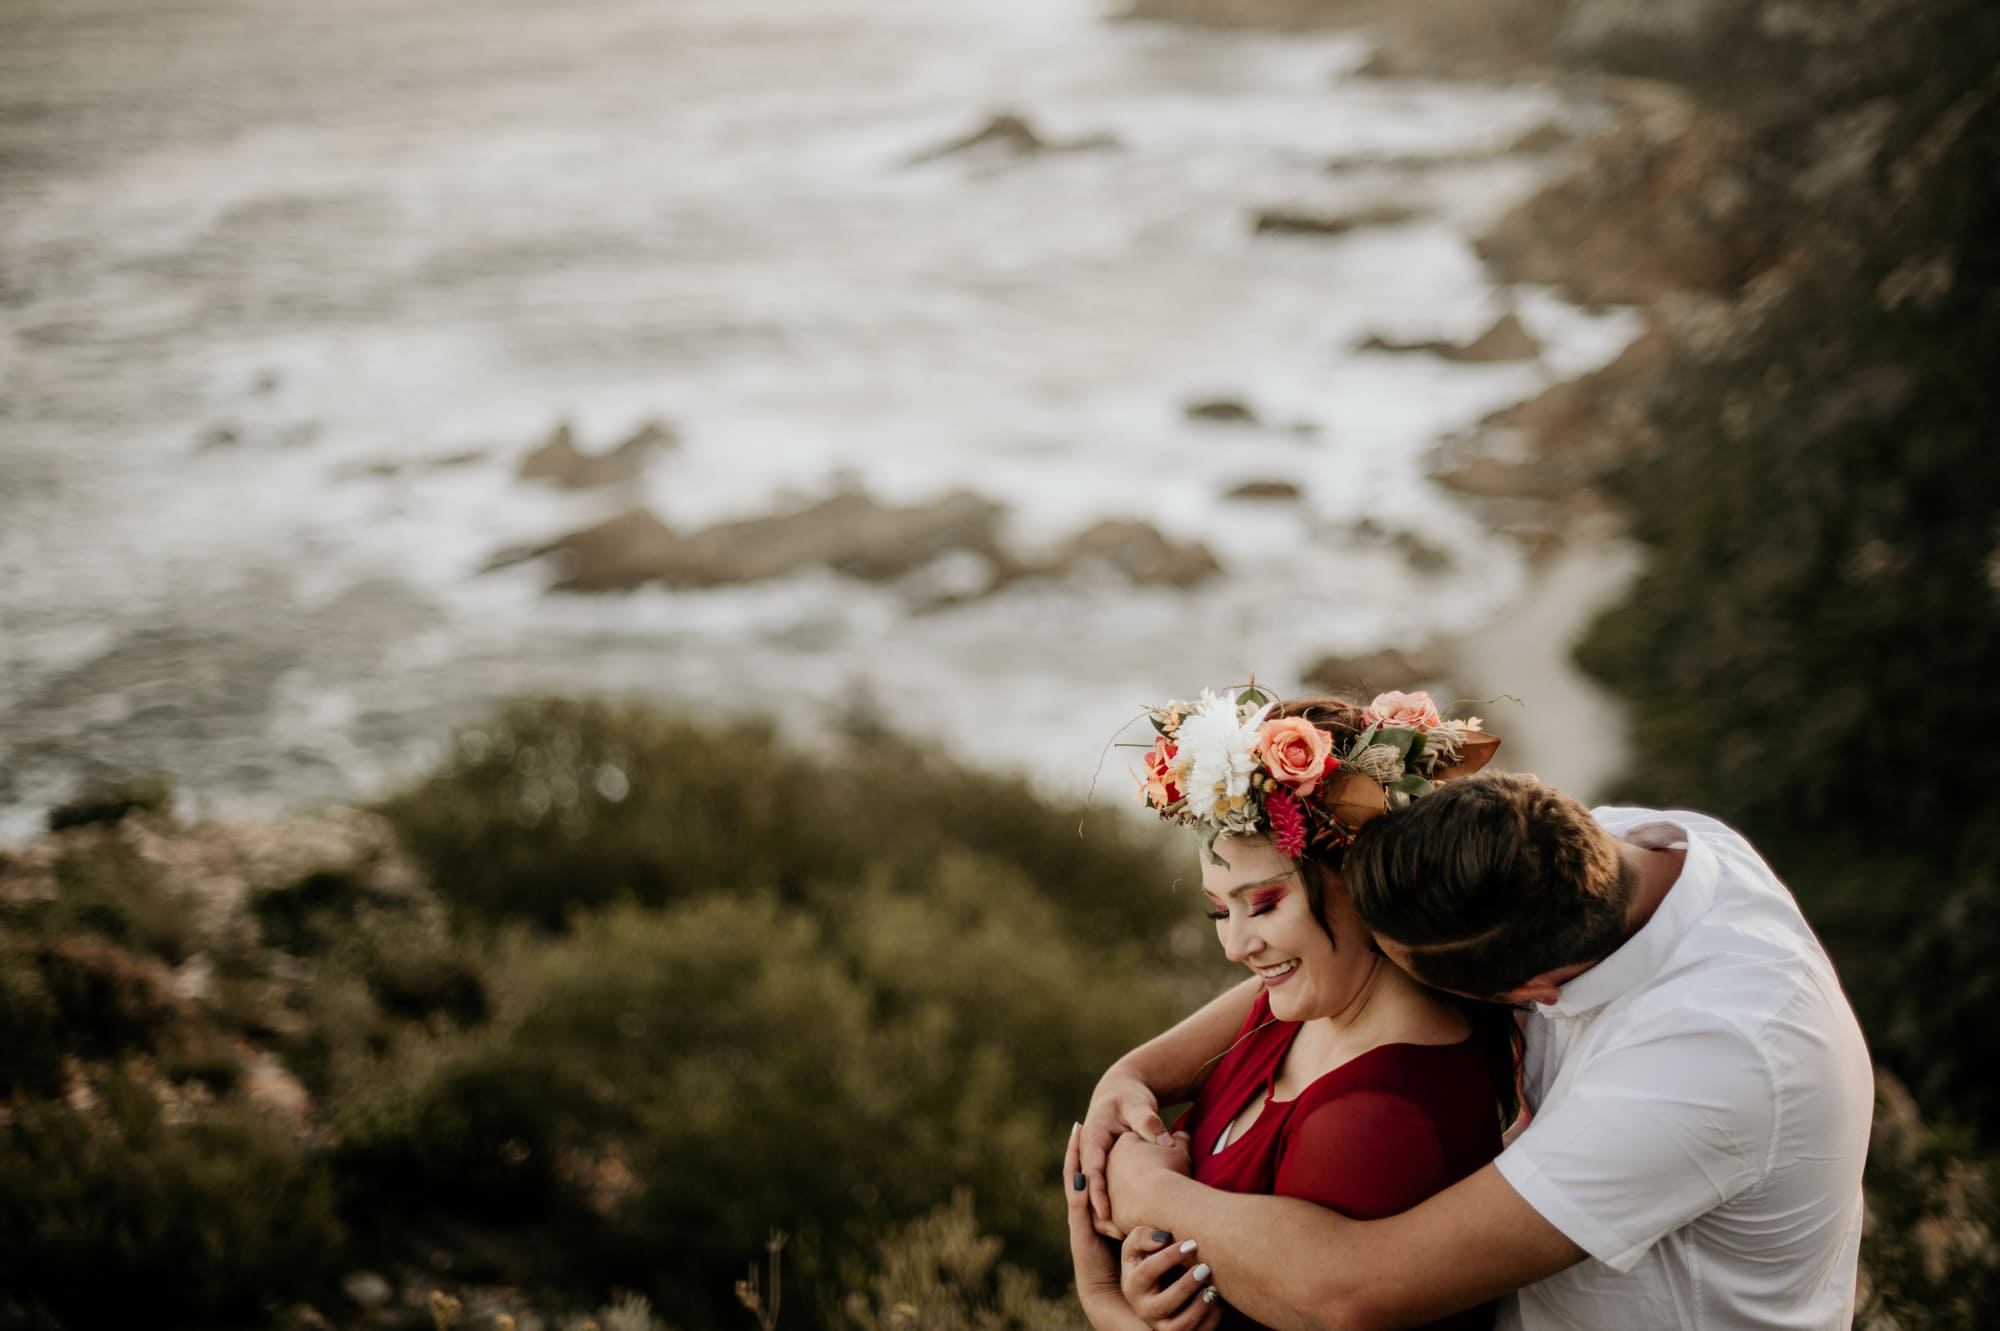 jesann-freddie-kranshoek-engagement-June-Richards-Photography-Destination-Weddings-Elopements-Garden-Route-42